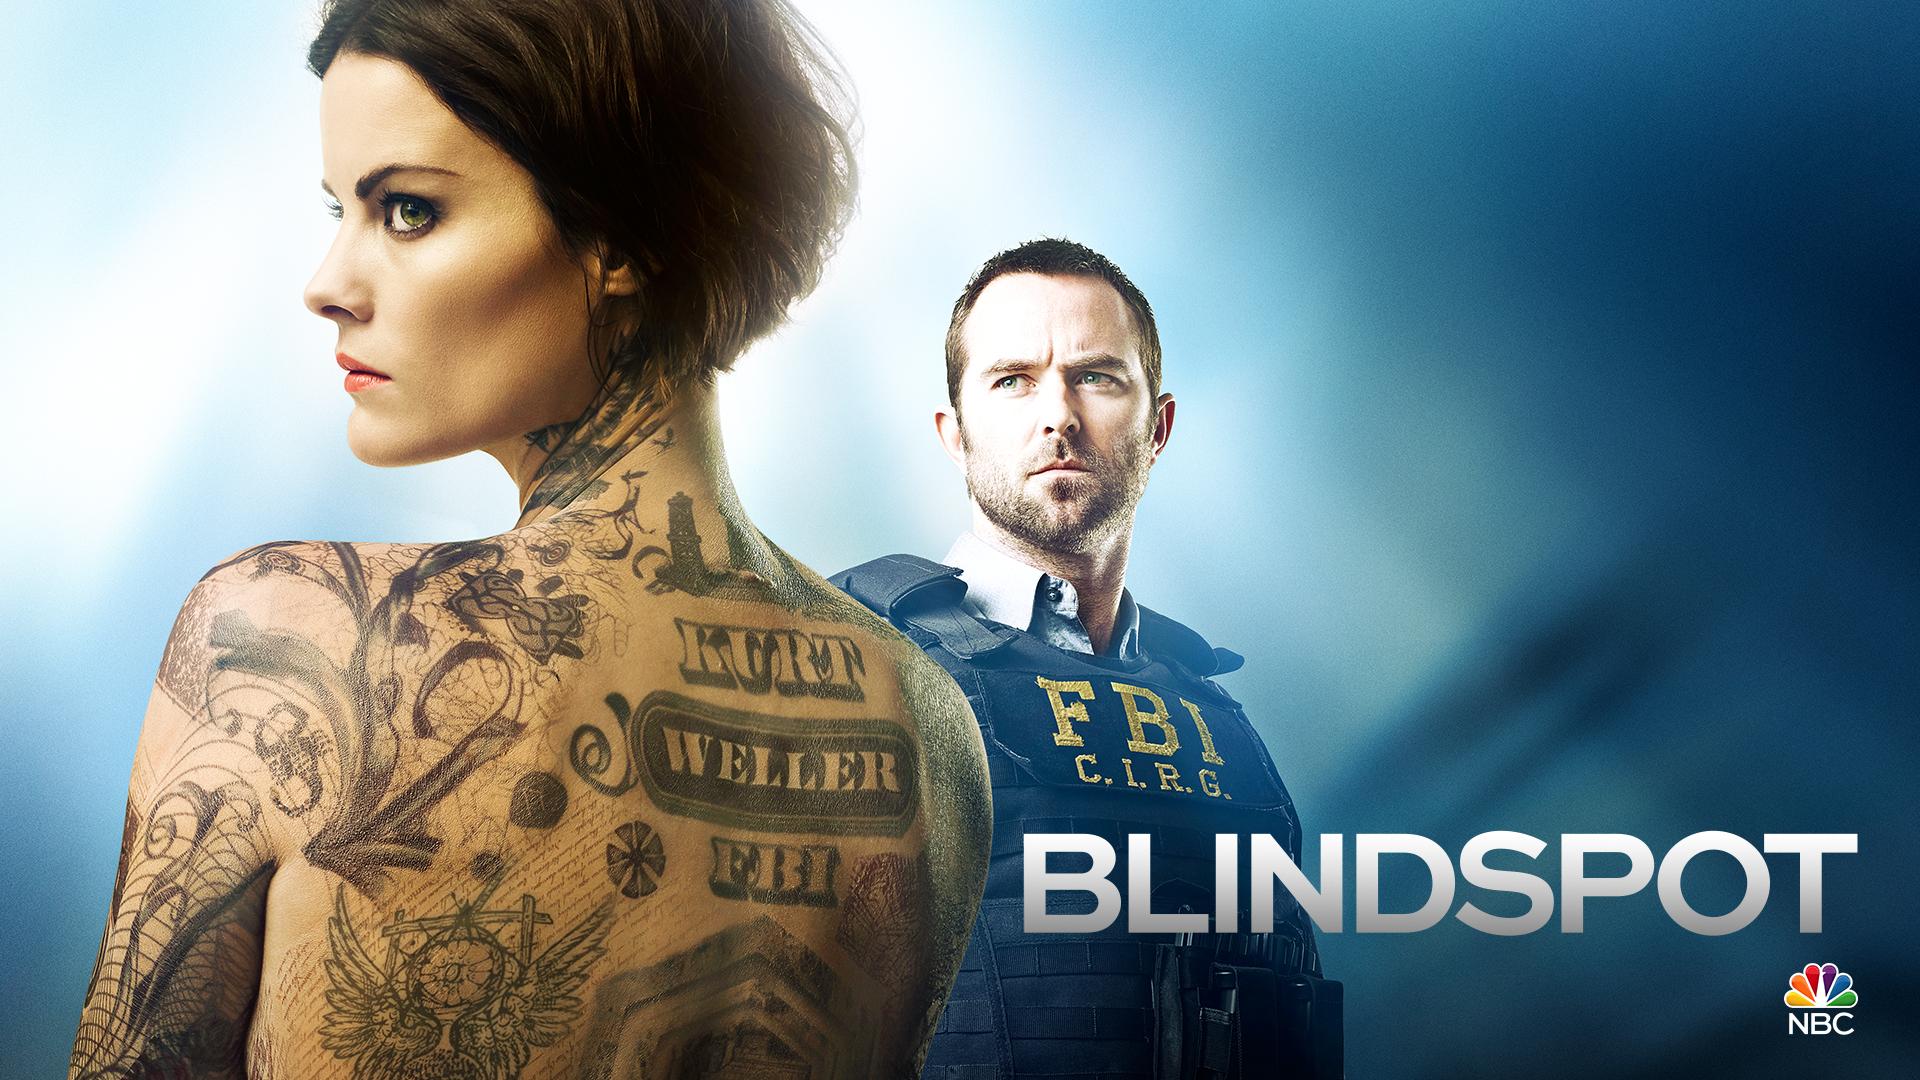 Blindspot «Blindspot» Recebe Ordem Para Temporada Completa